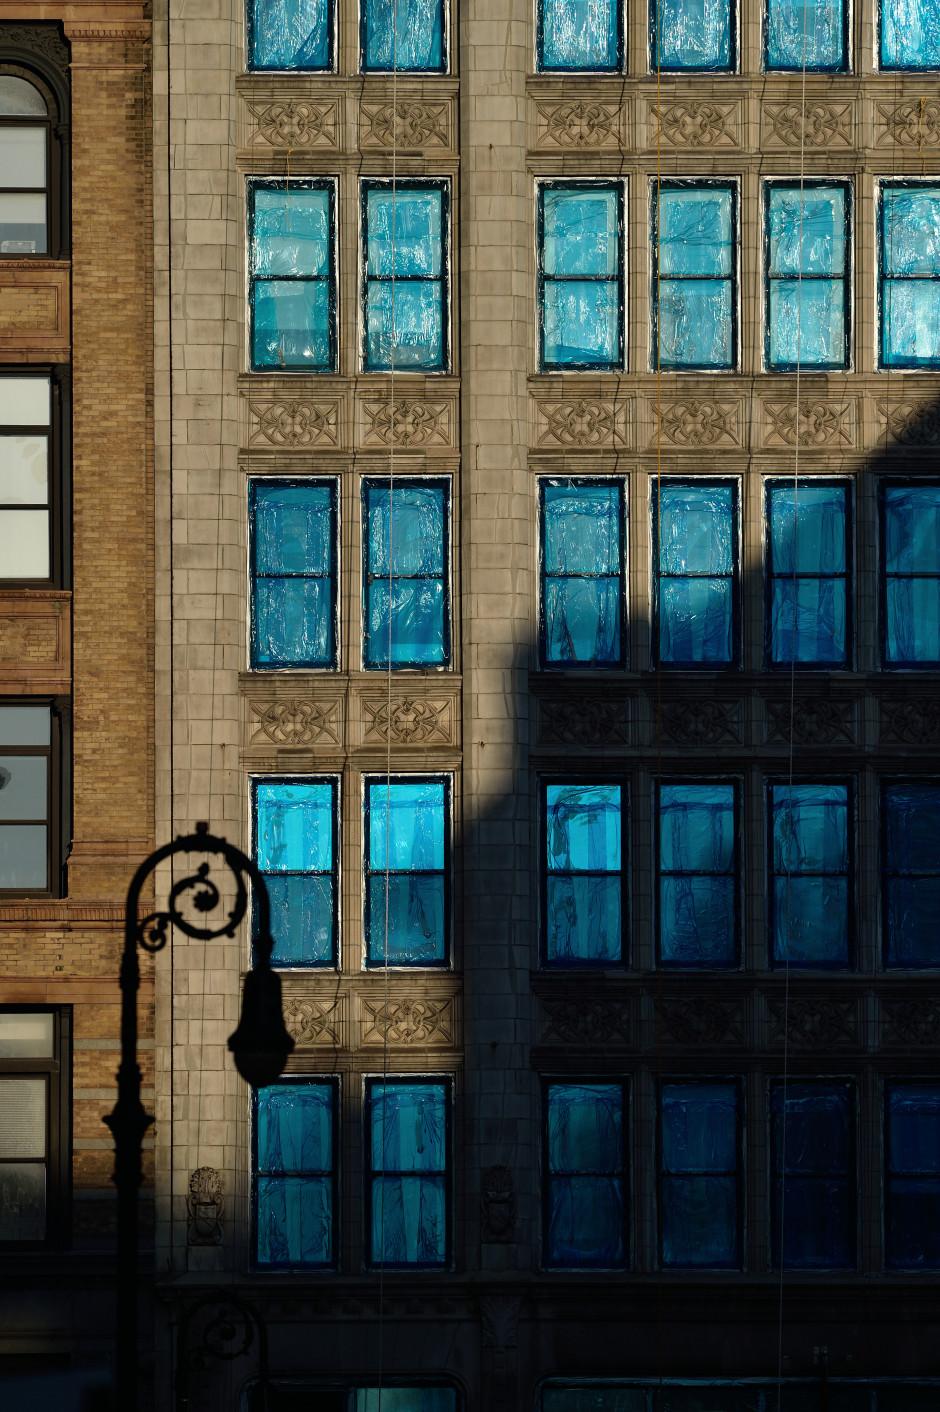 © Drew Gurian - 1/4000 - f/5.6 - 300mm